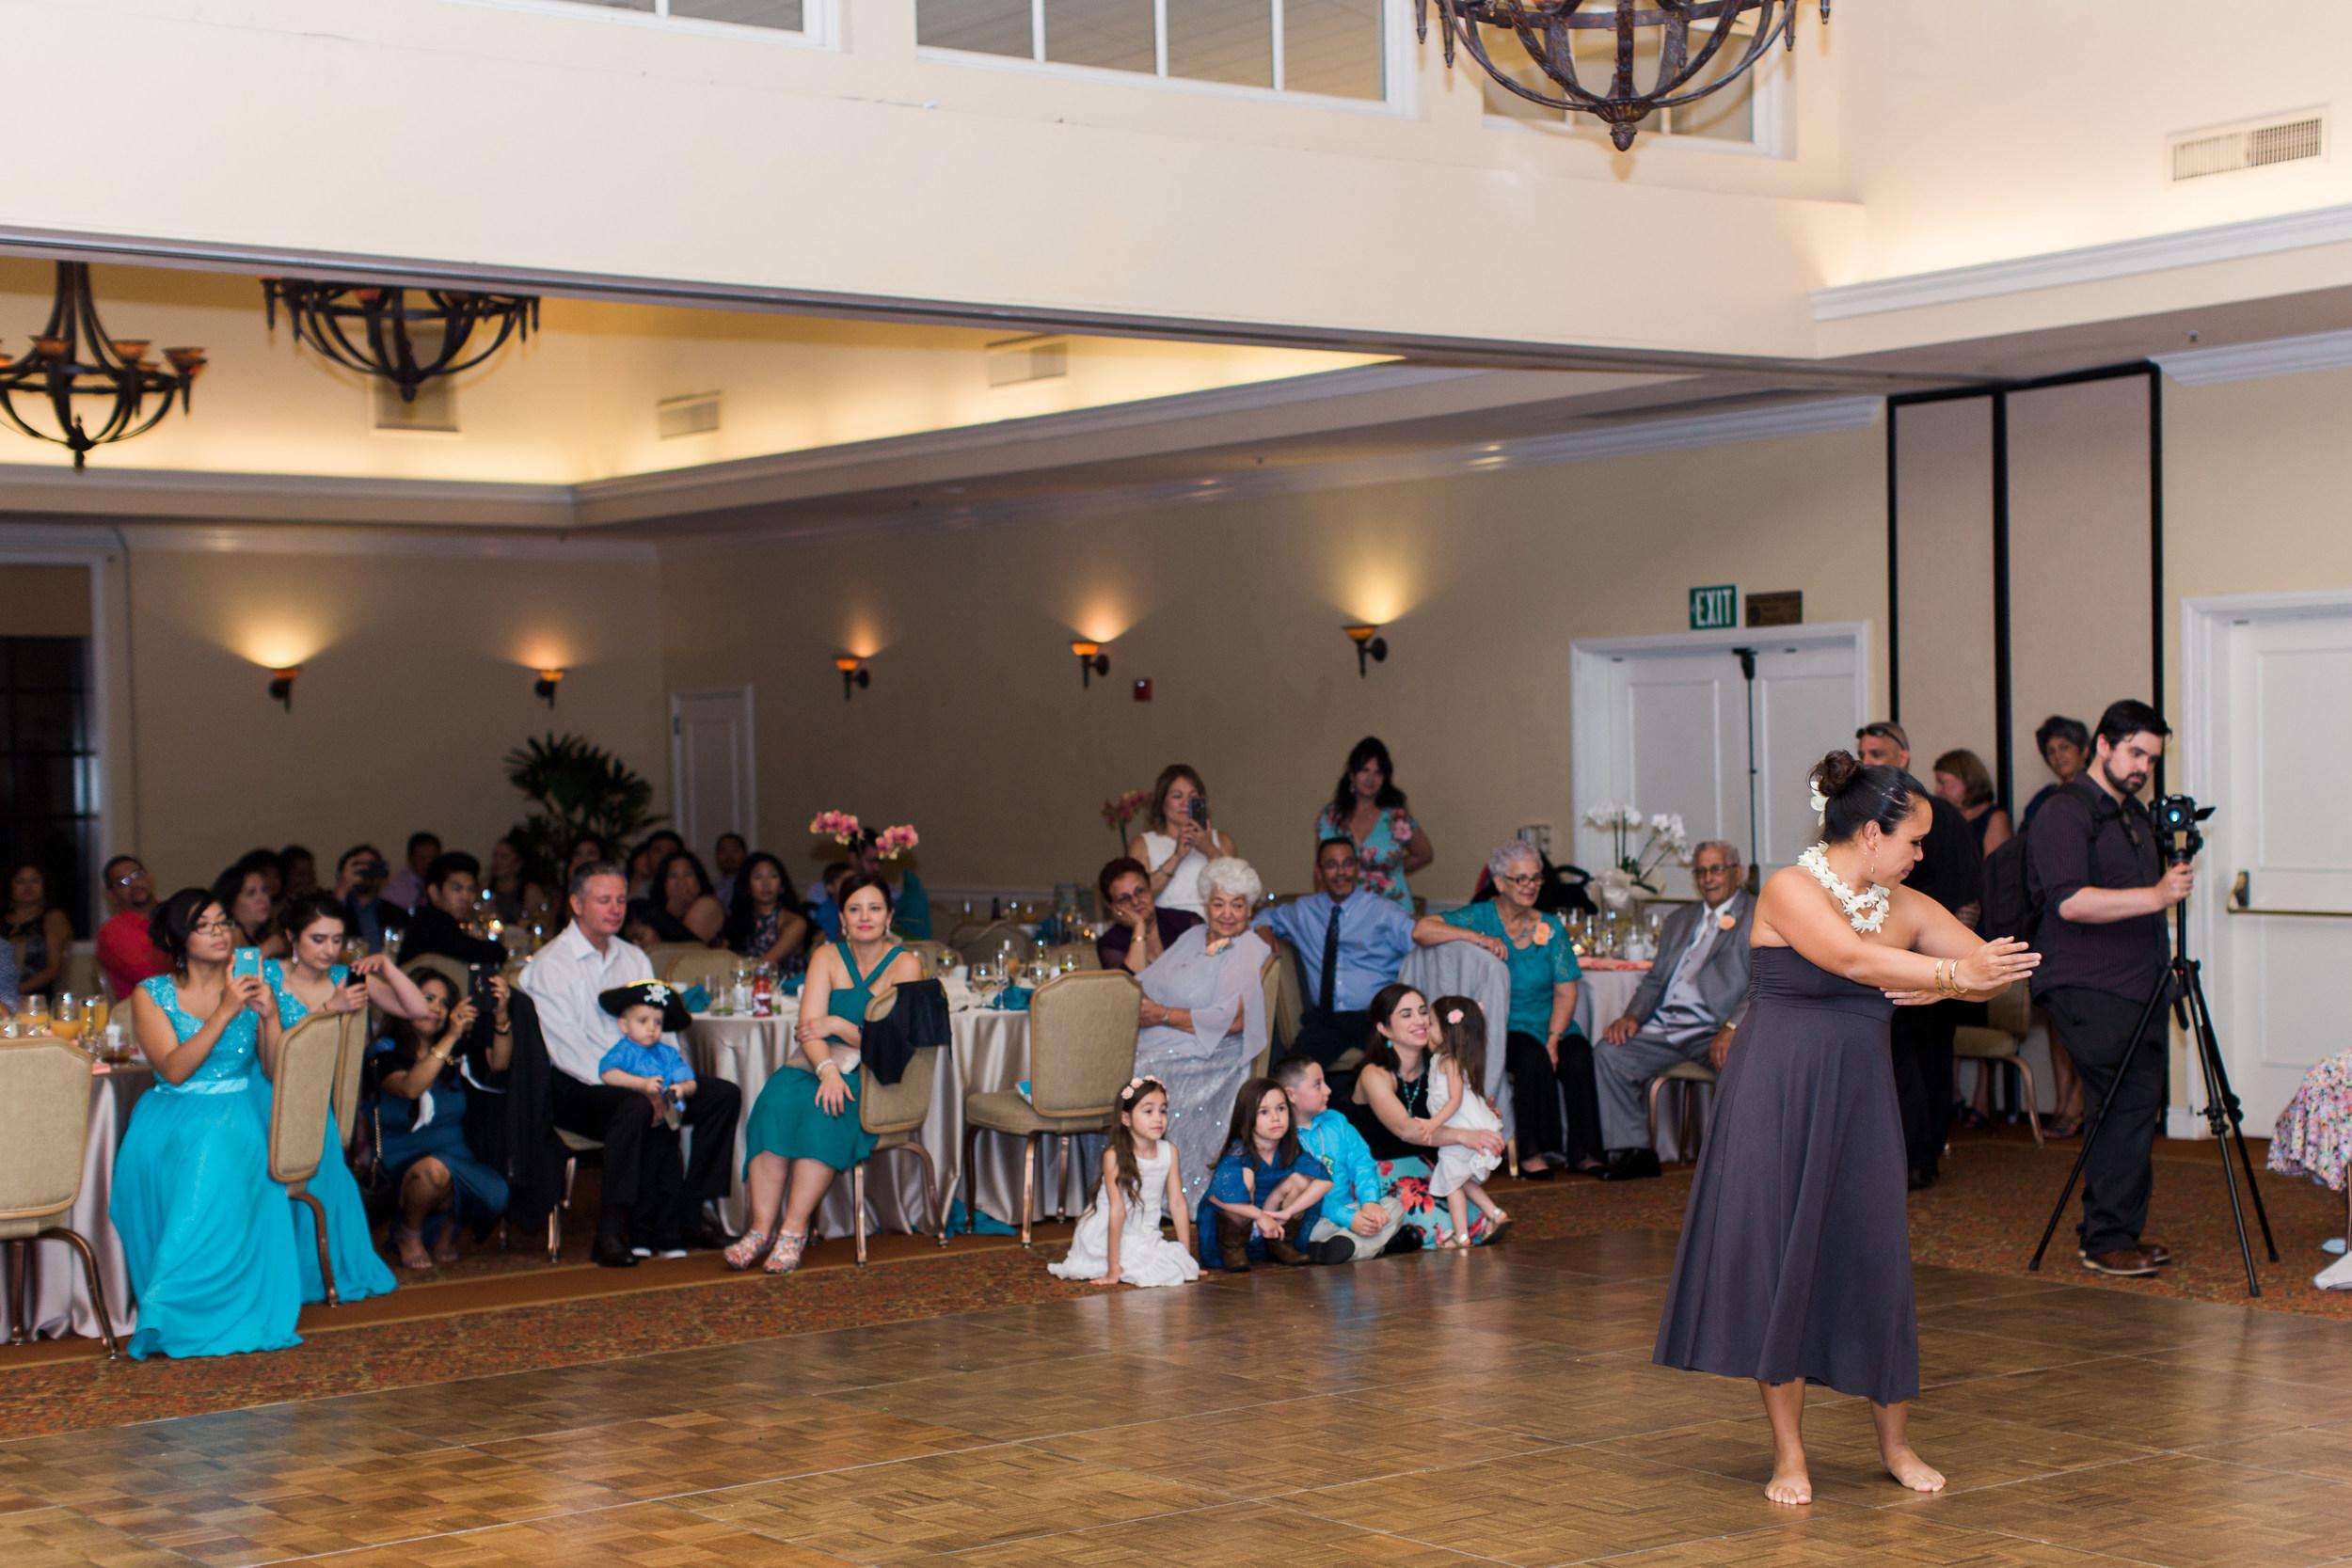 hawaiian-inspired-wedding-at-blackhawk-country-club-3471.jpg